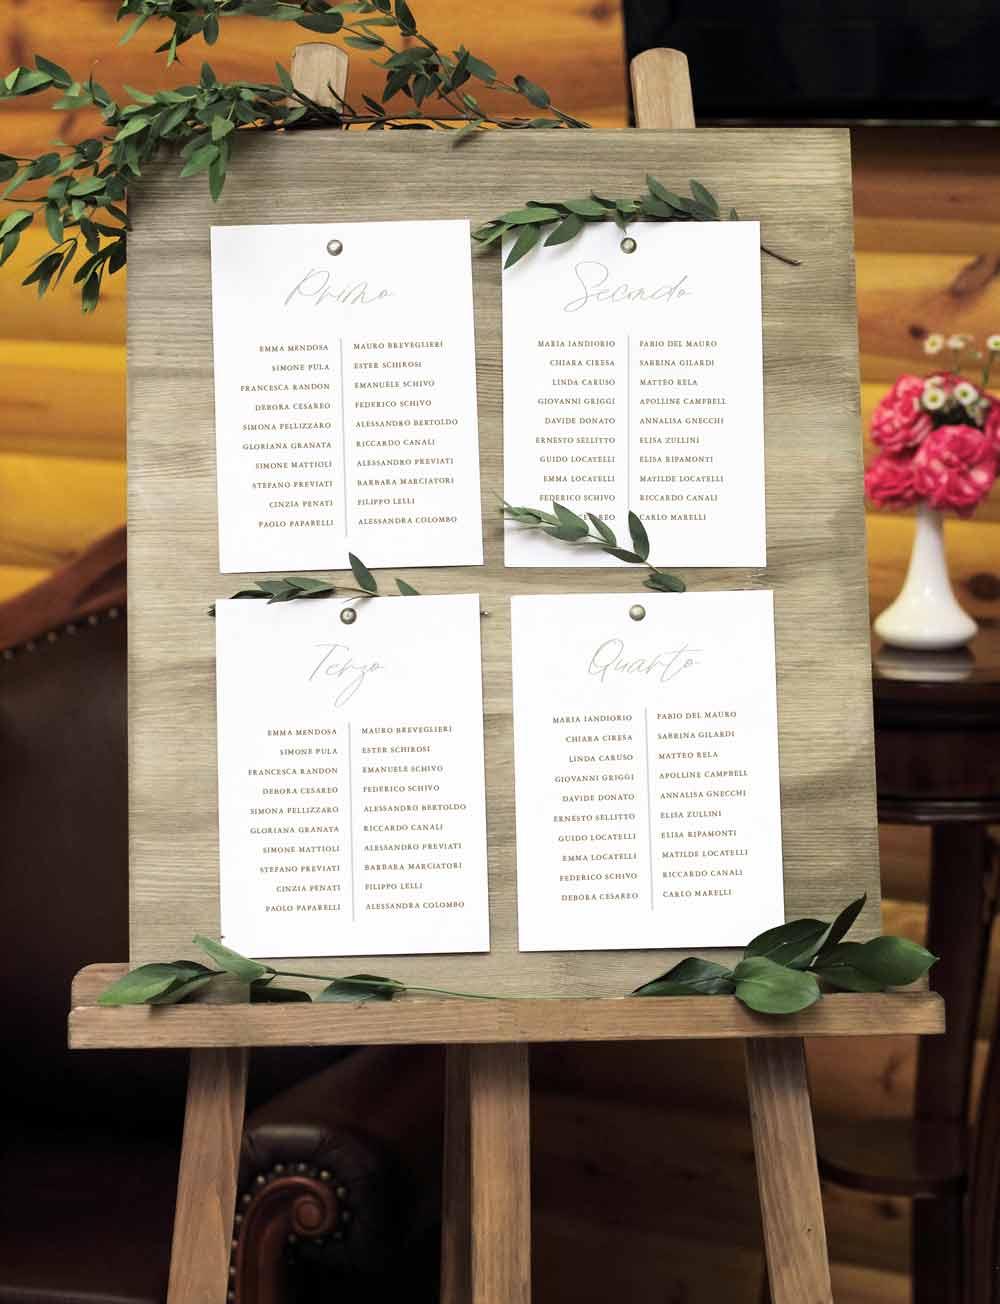 Tableau-de-mariage-wedding-matrimonio-nozze-idee-fogli-2020-elegante-moderno-fiori